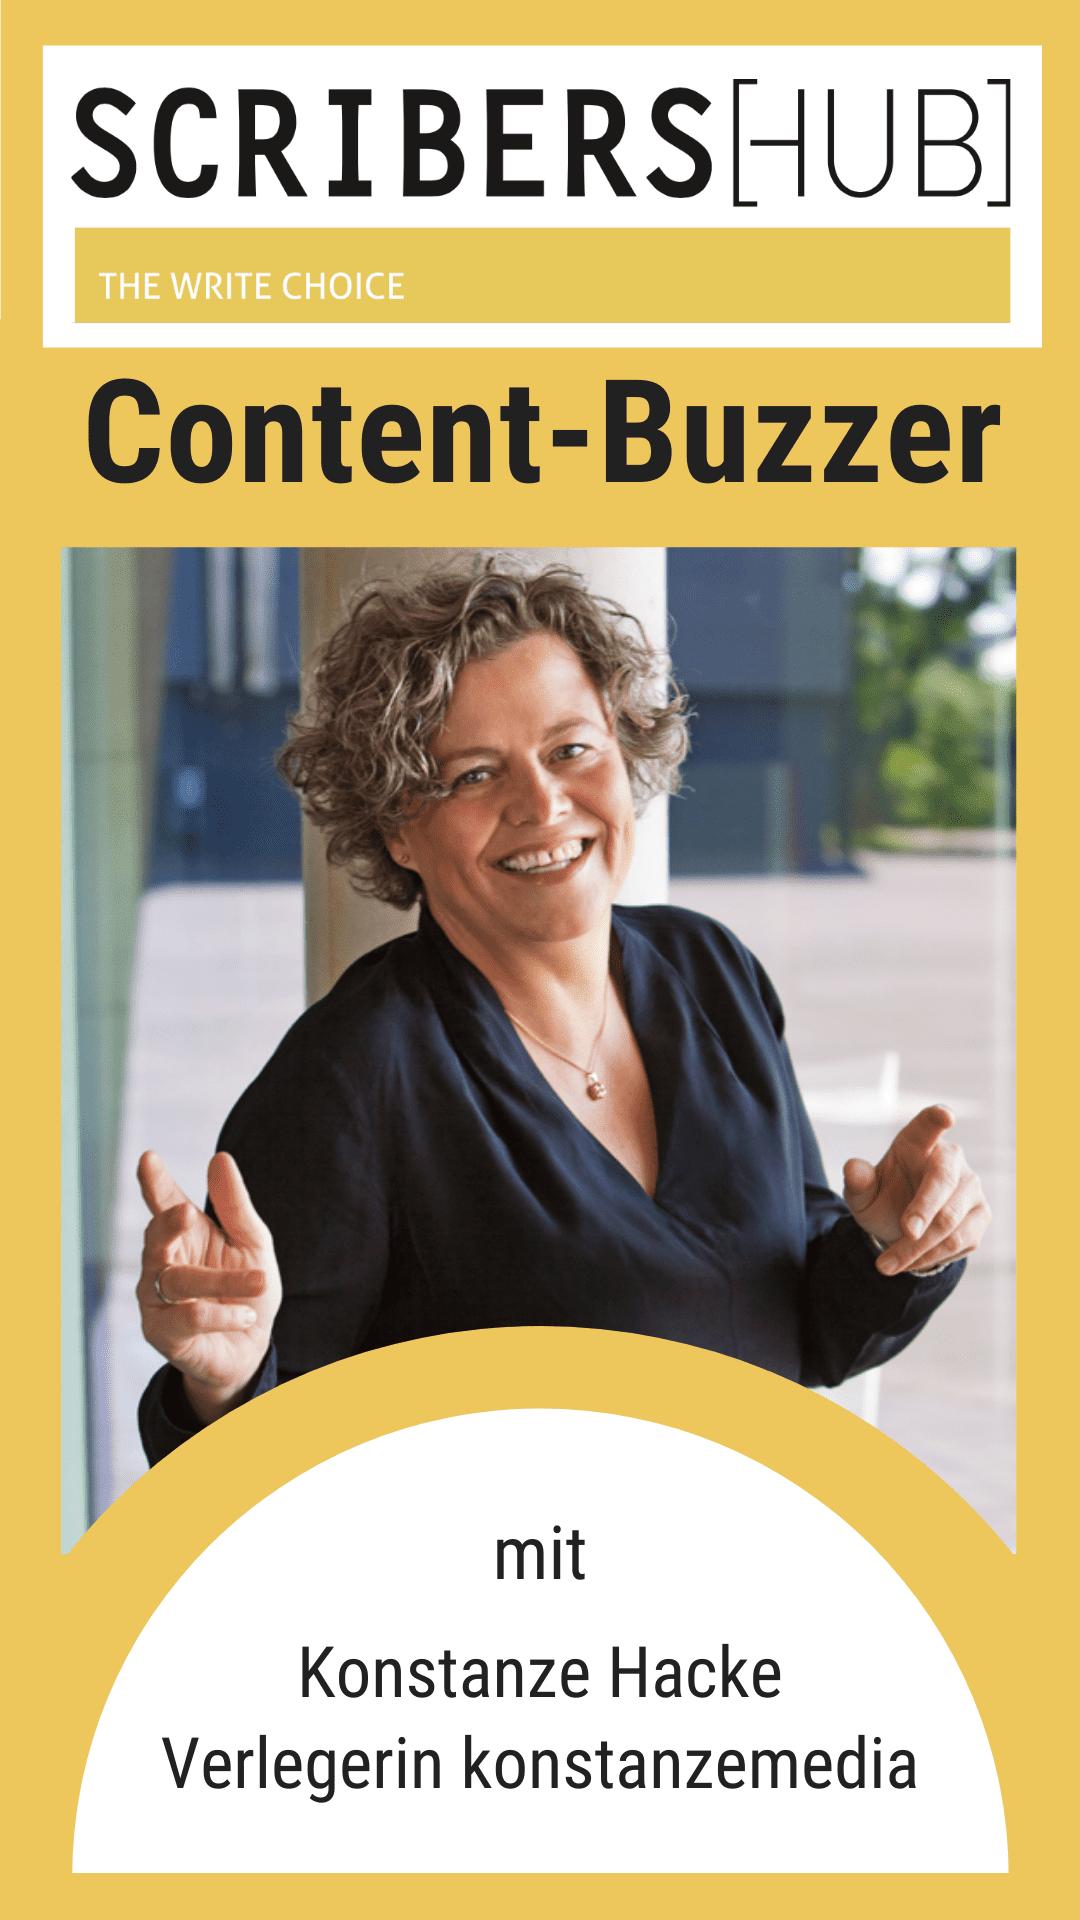 Guter Content ins Herz der Zielgruppe